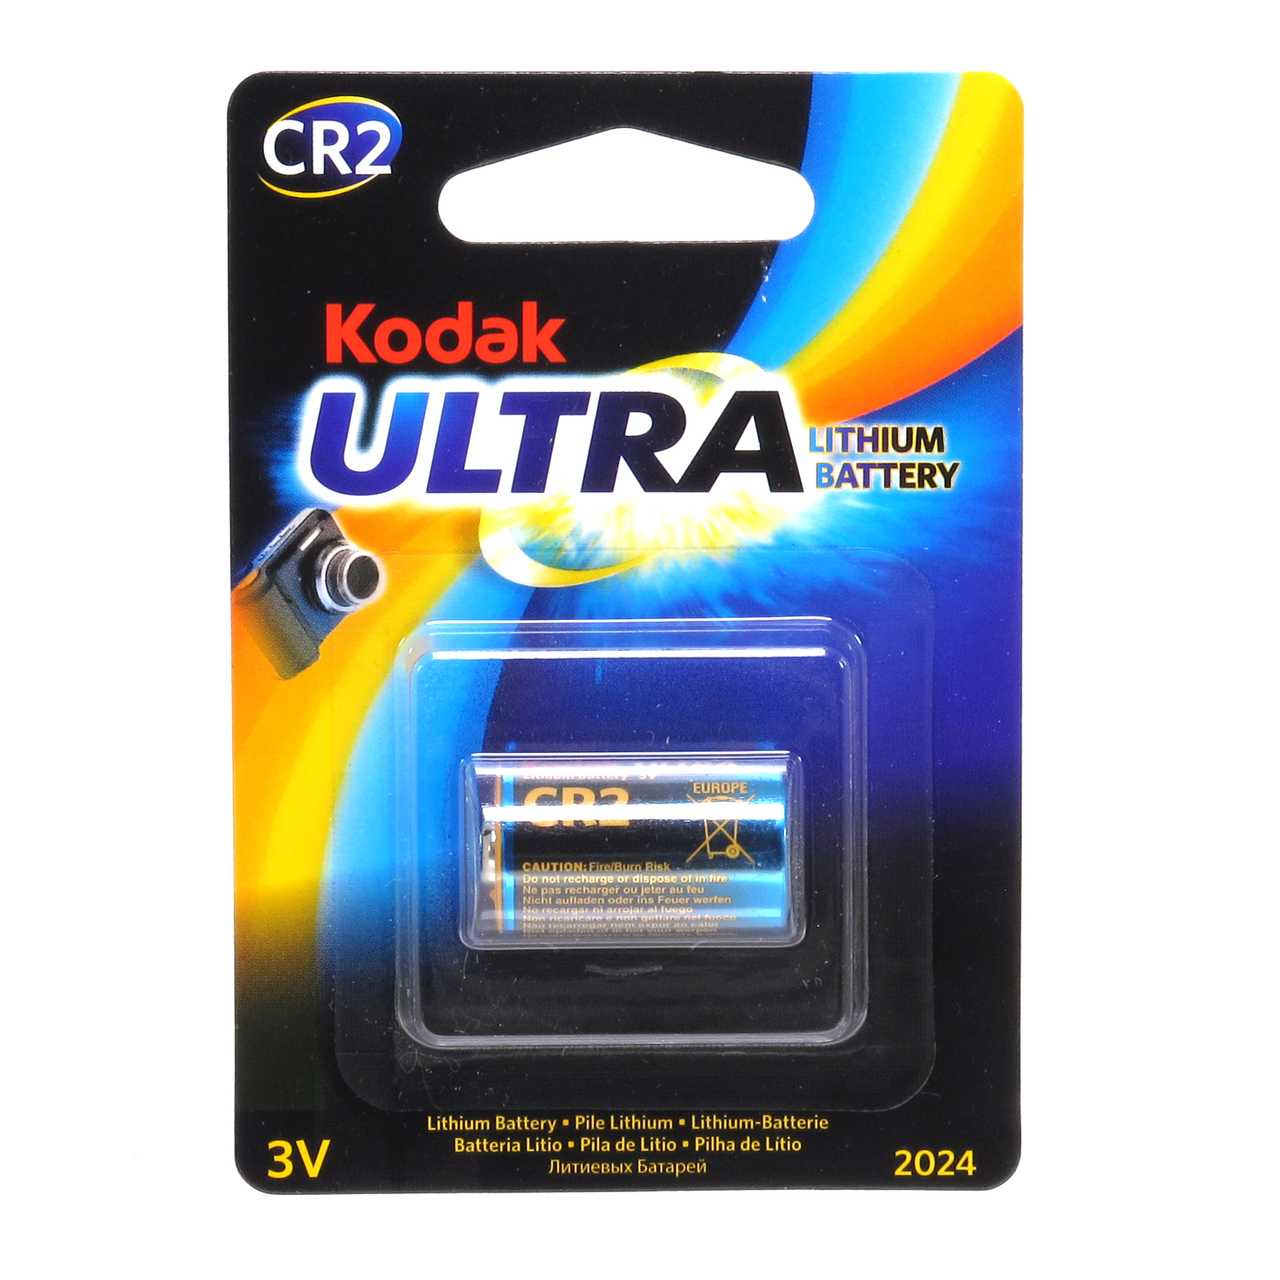 KODAK ULTRA PREMIUM LITHIUM BATTERY - CR2